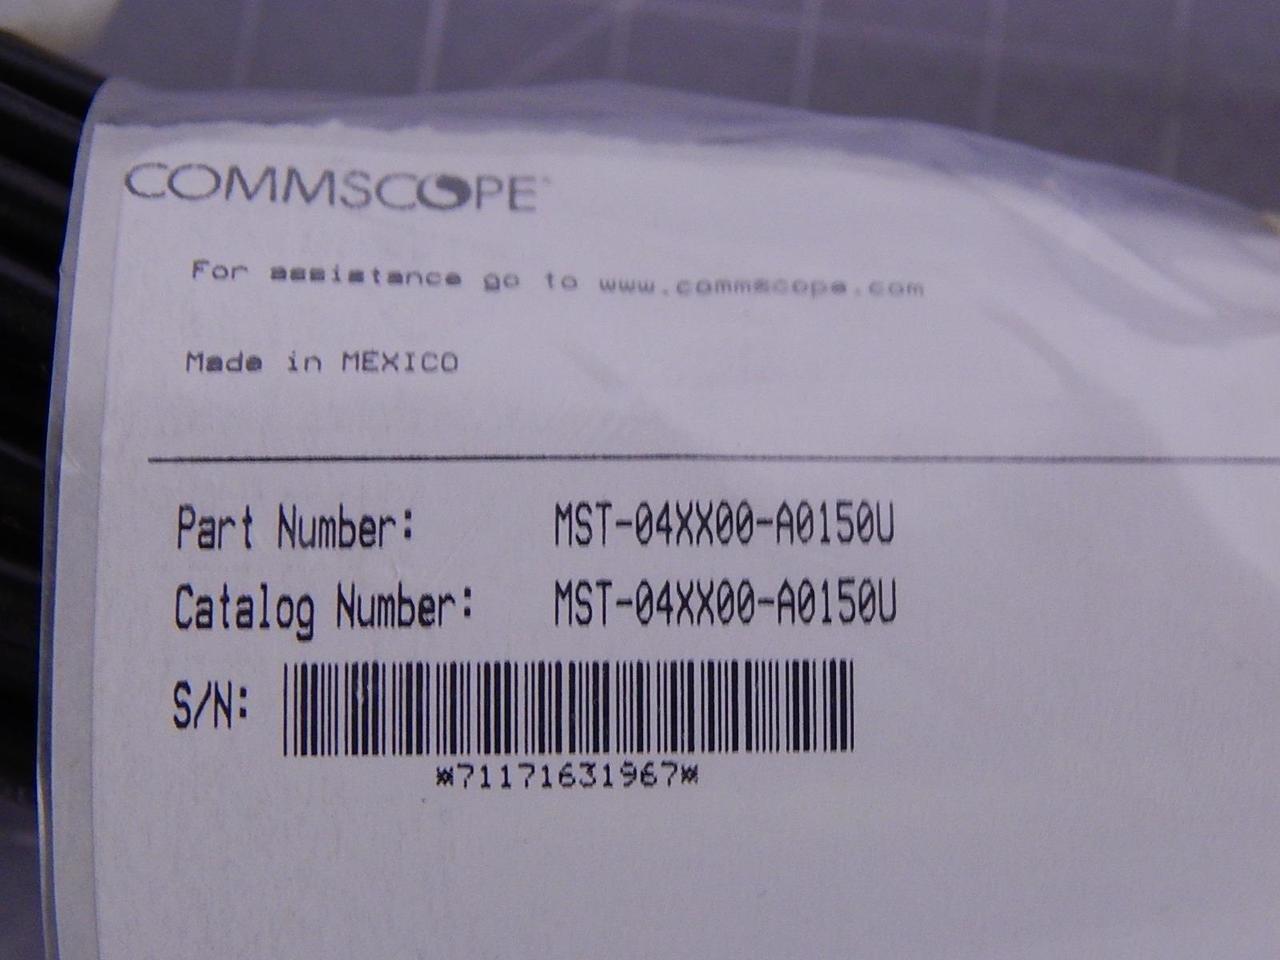 Commscope MST-04XX00-A0150U 4 Port Fiber Optic Multiport Service Terminal 150 FT